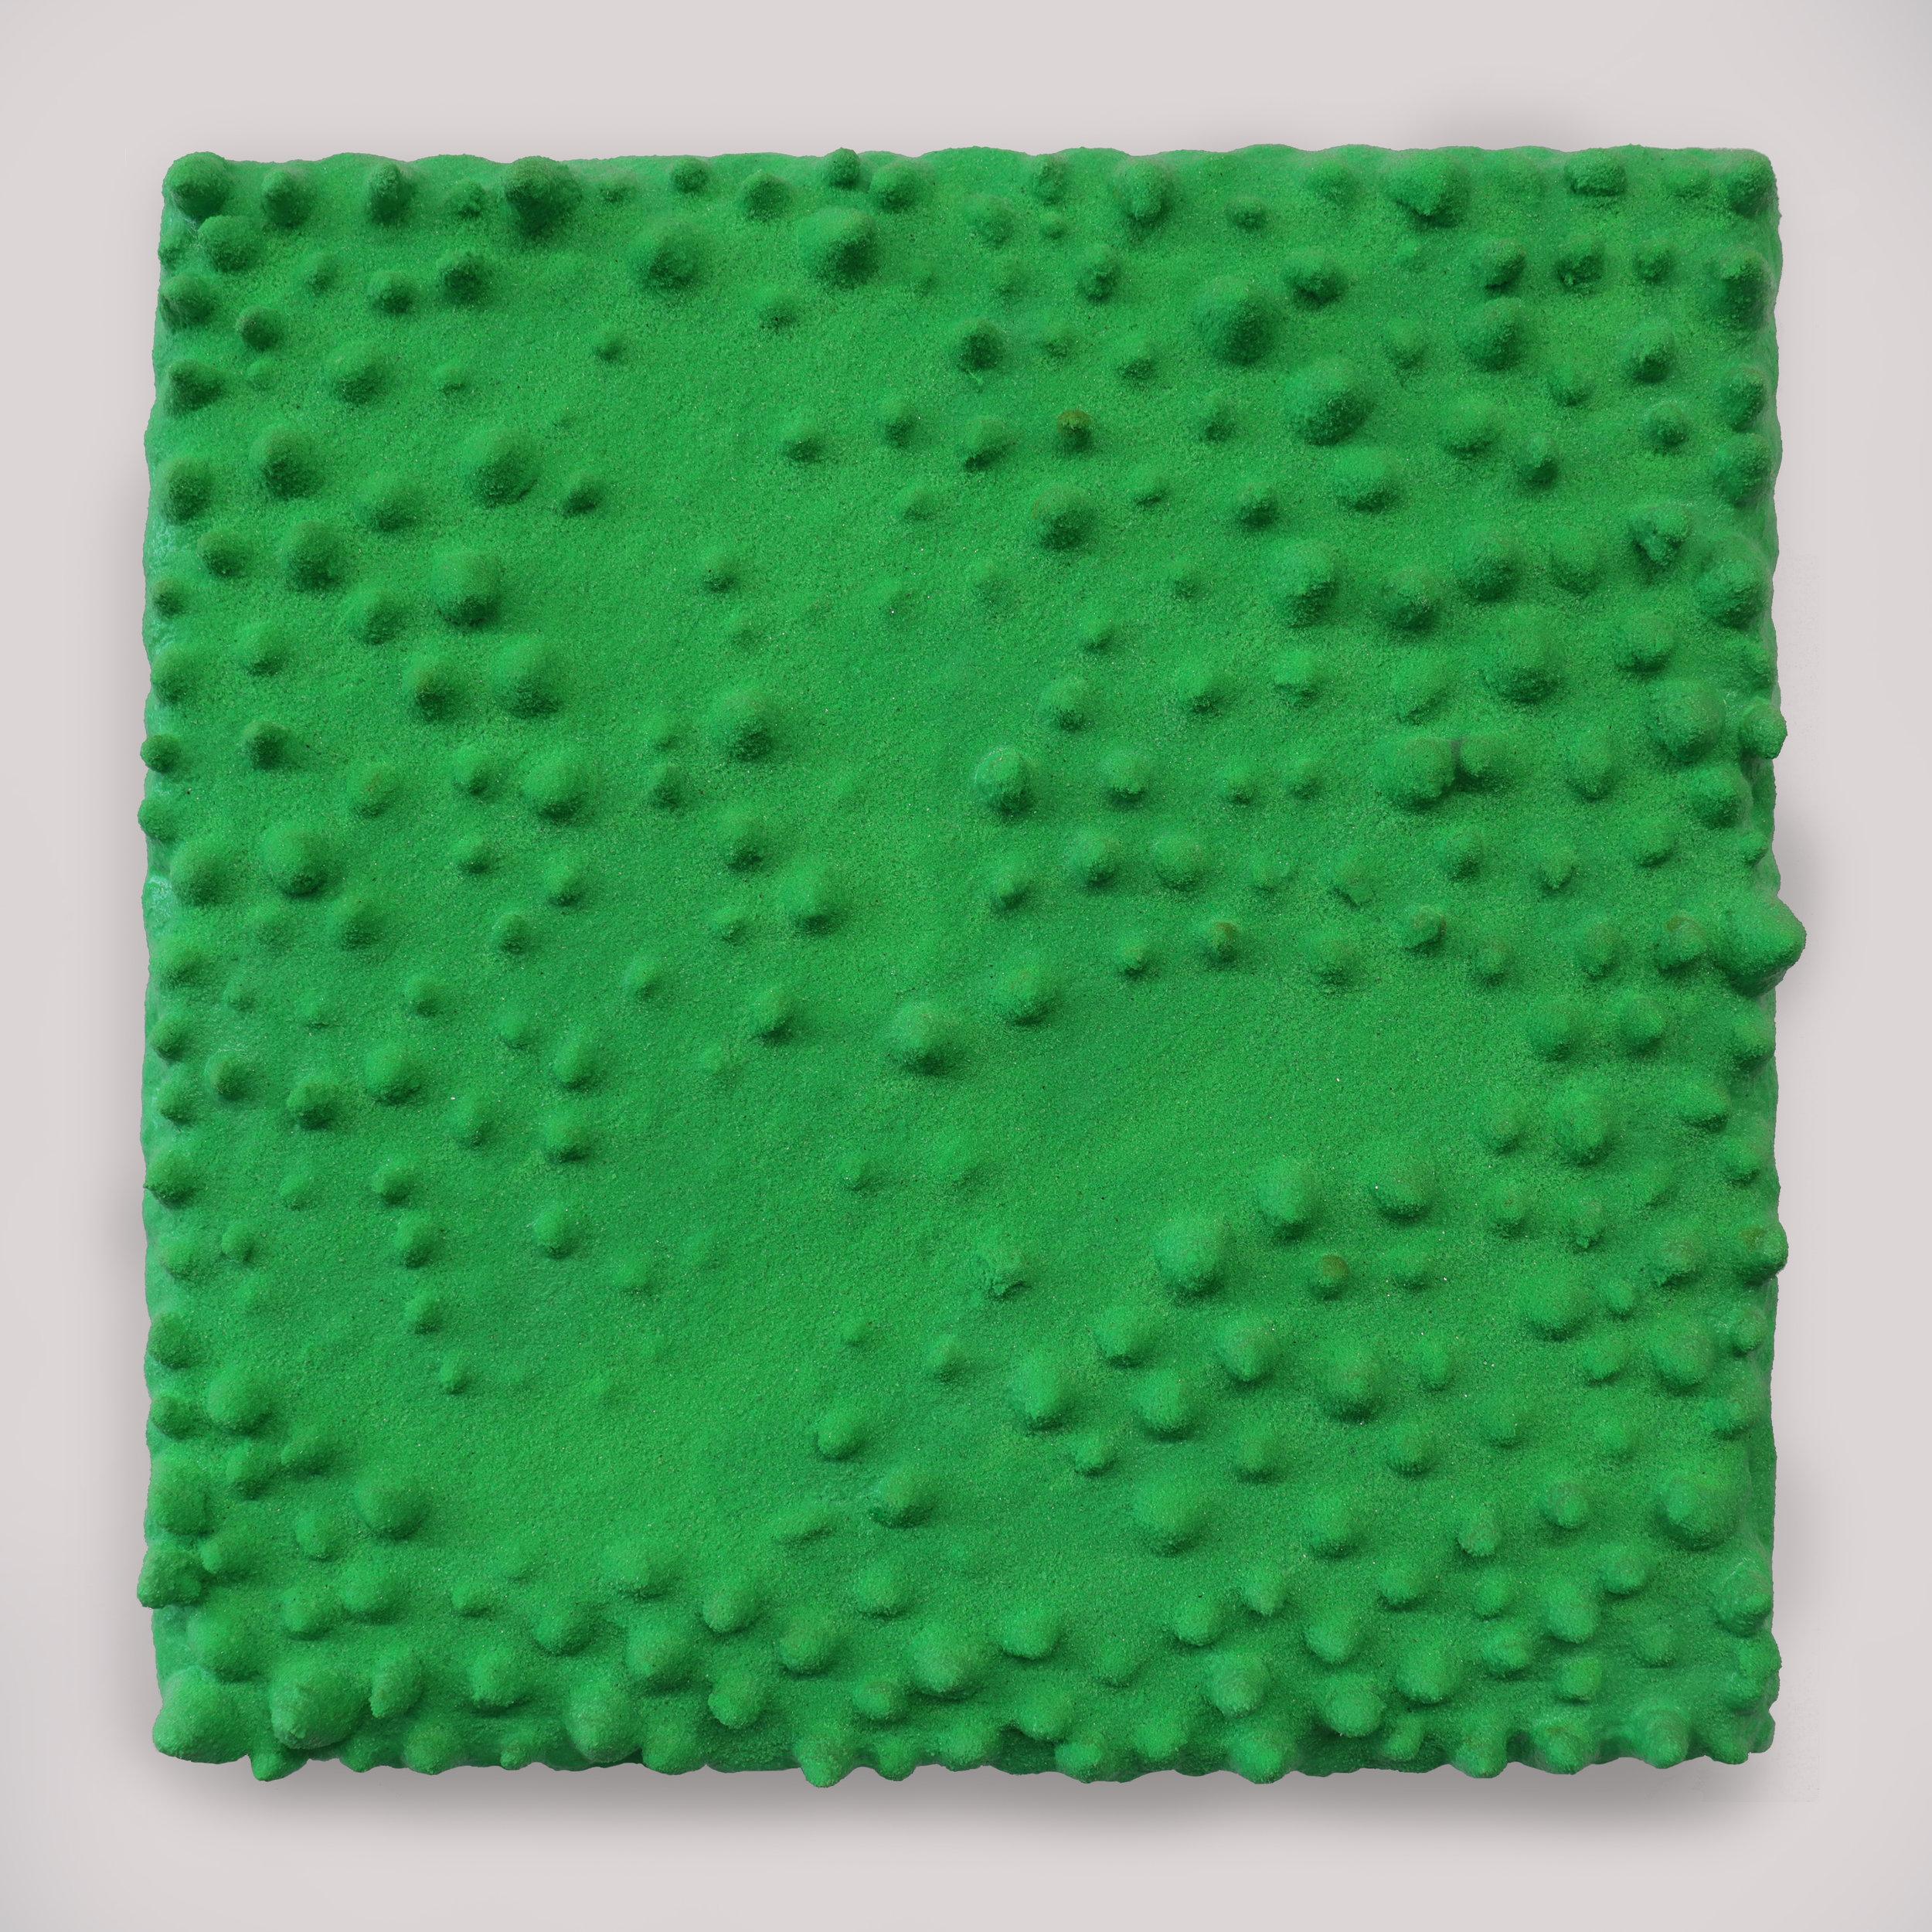 Green Lumps